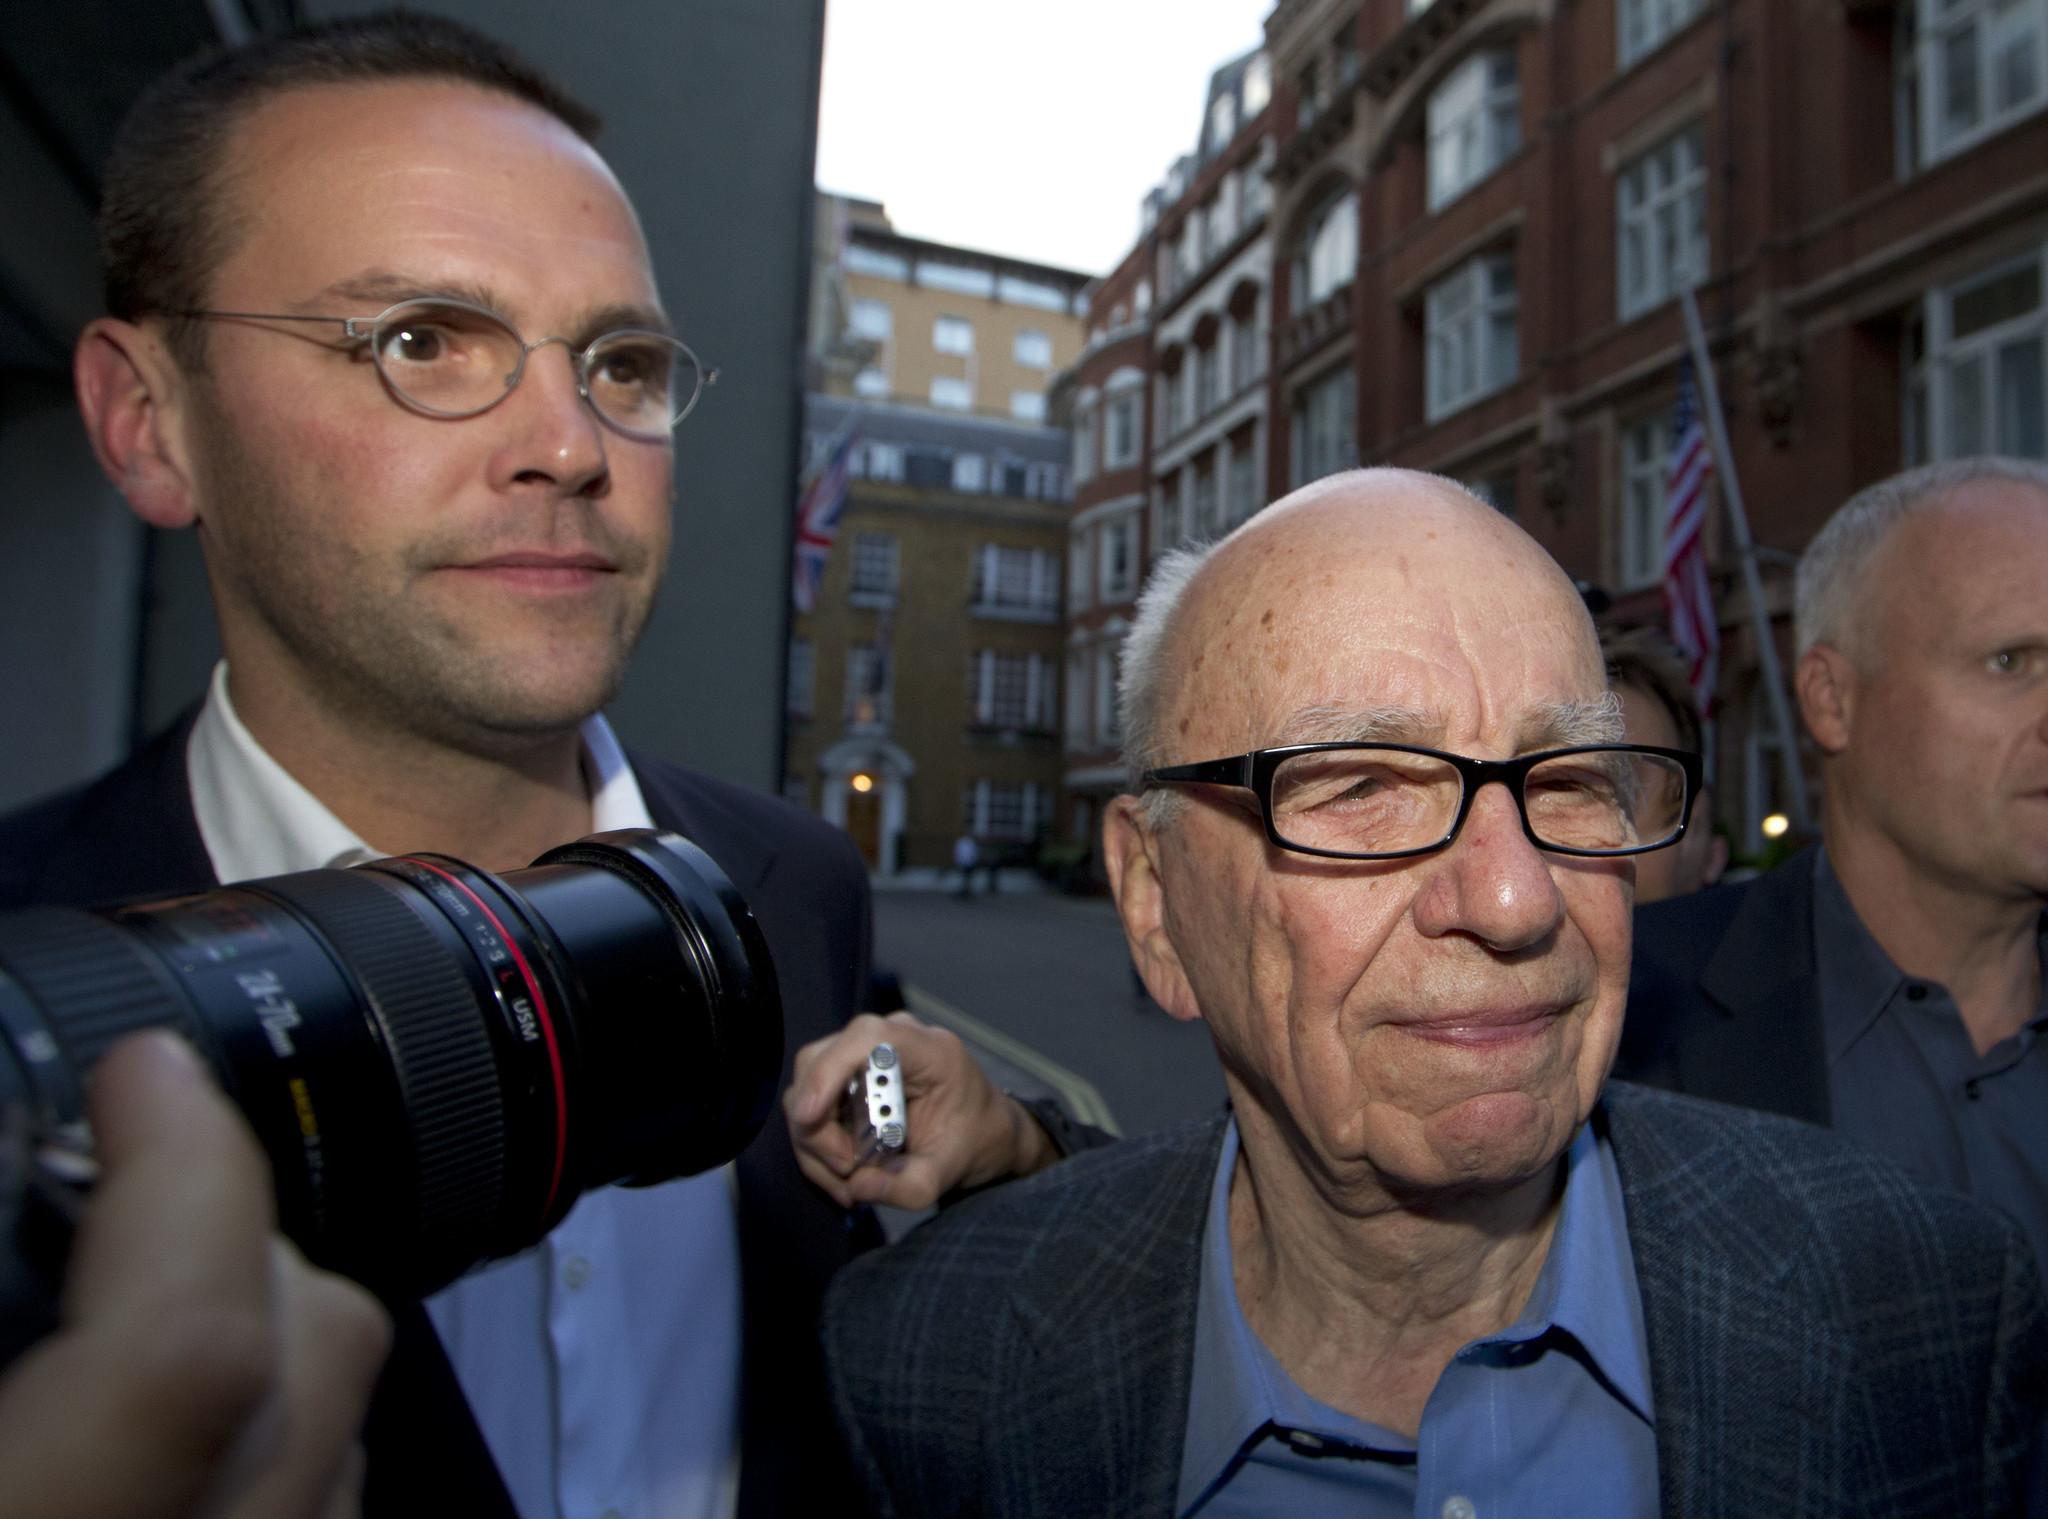 Rupert Murdoch's son slams News Corp's climate change coverage amid devastating Australian fires